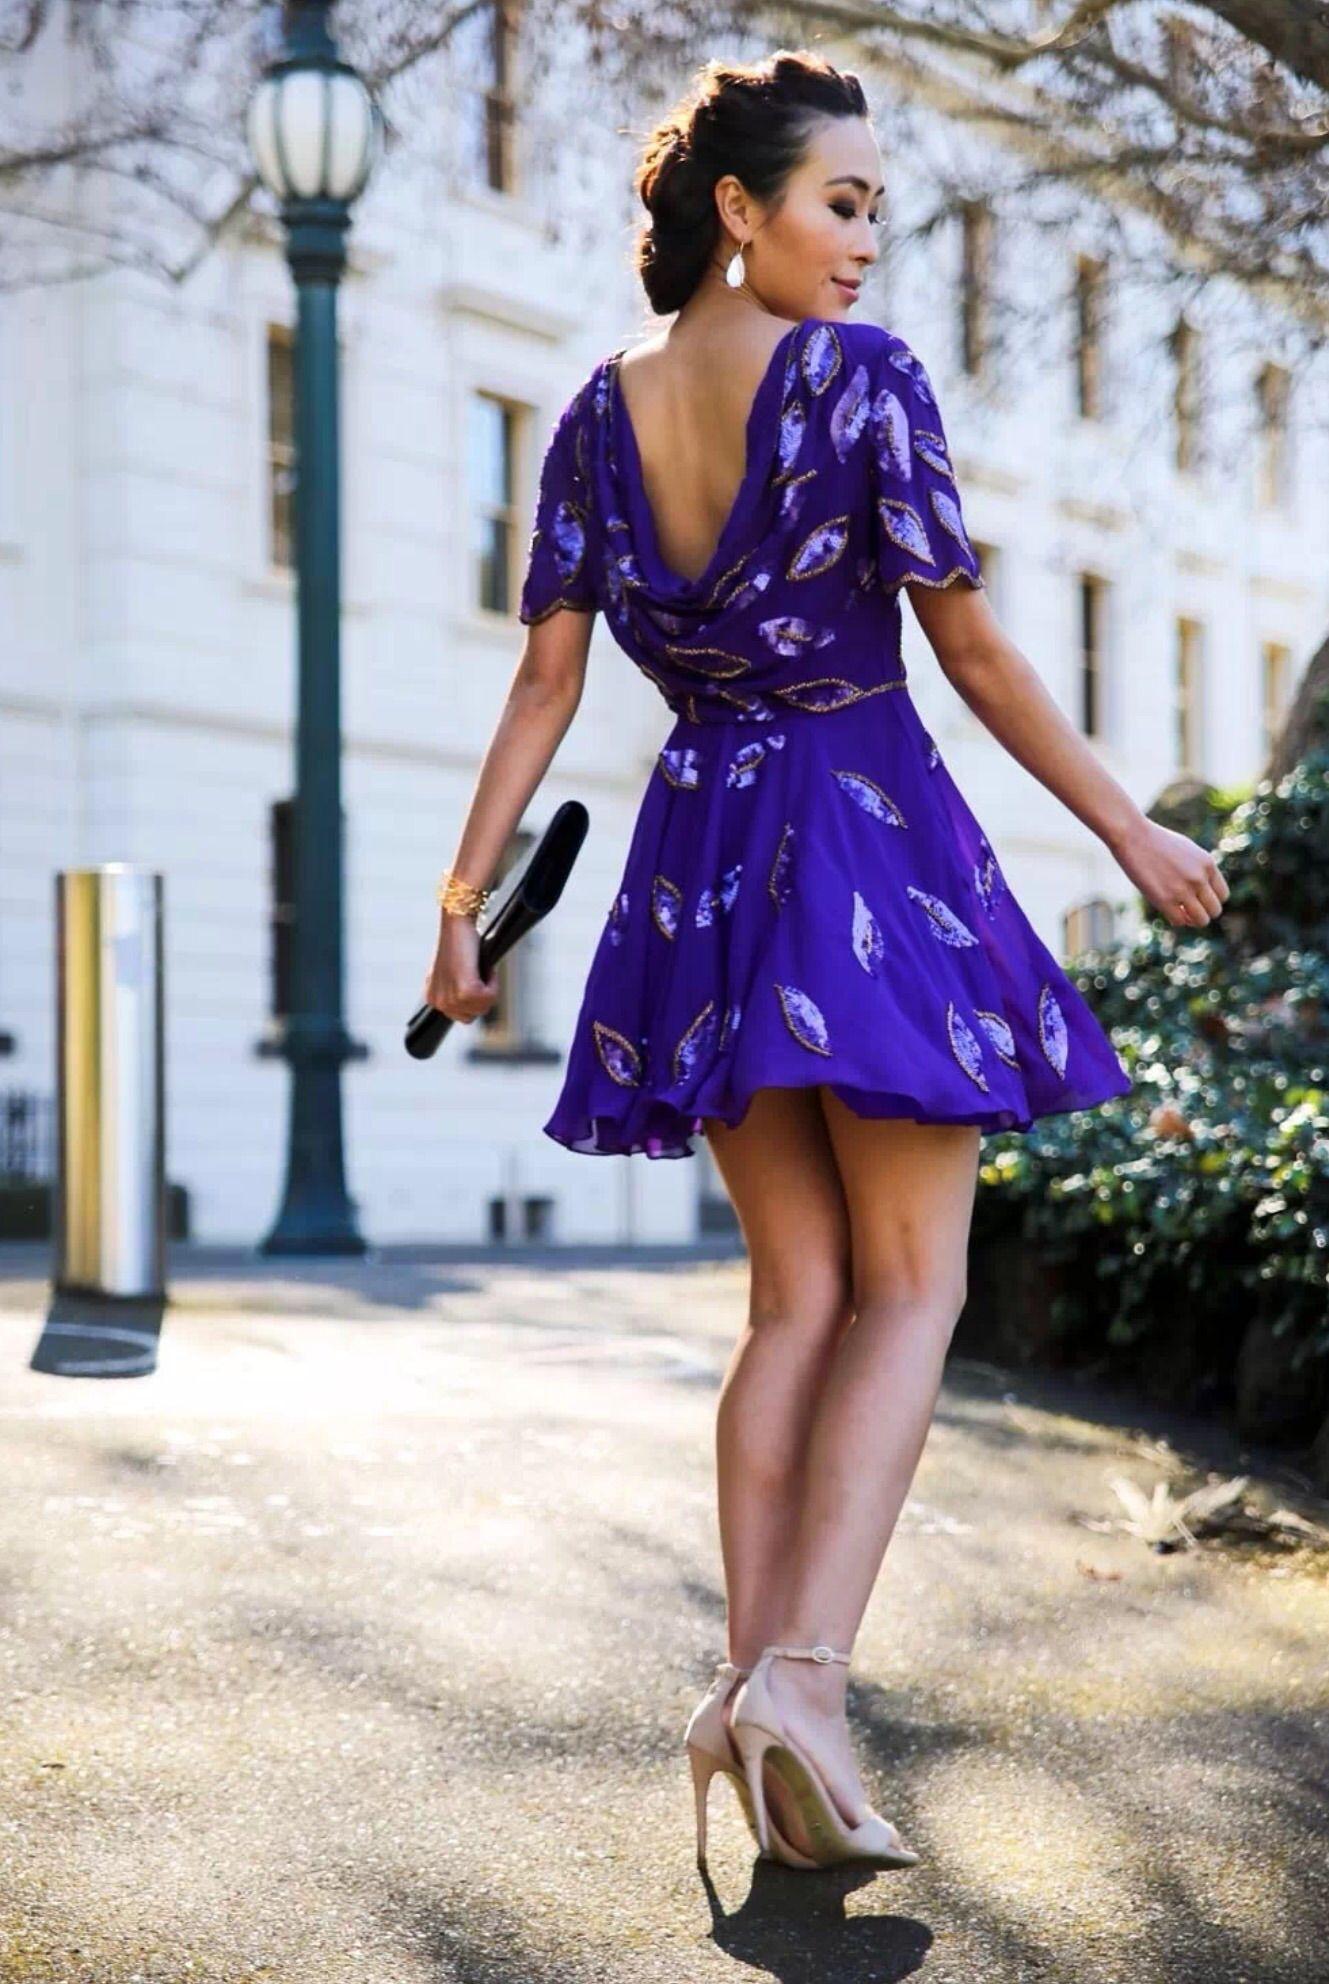 Virgos Lounge Loose Back Purple Skater Dress.